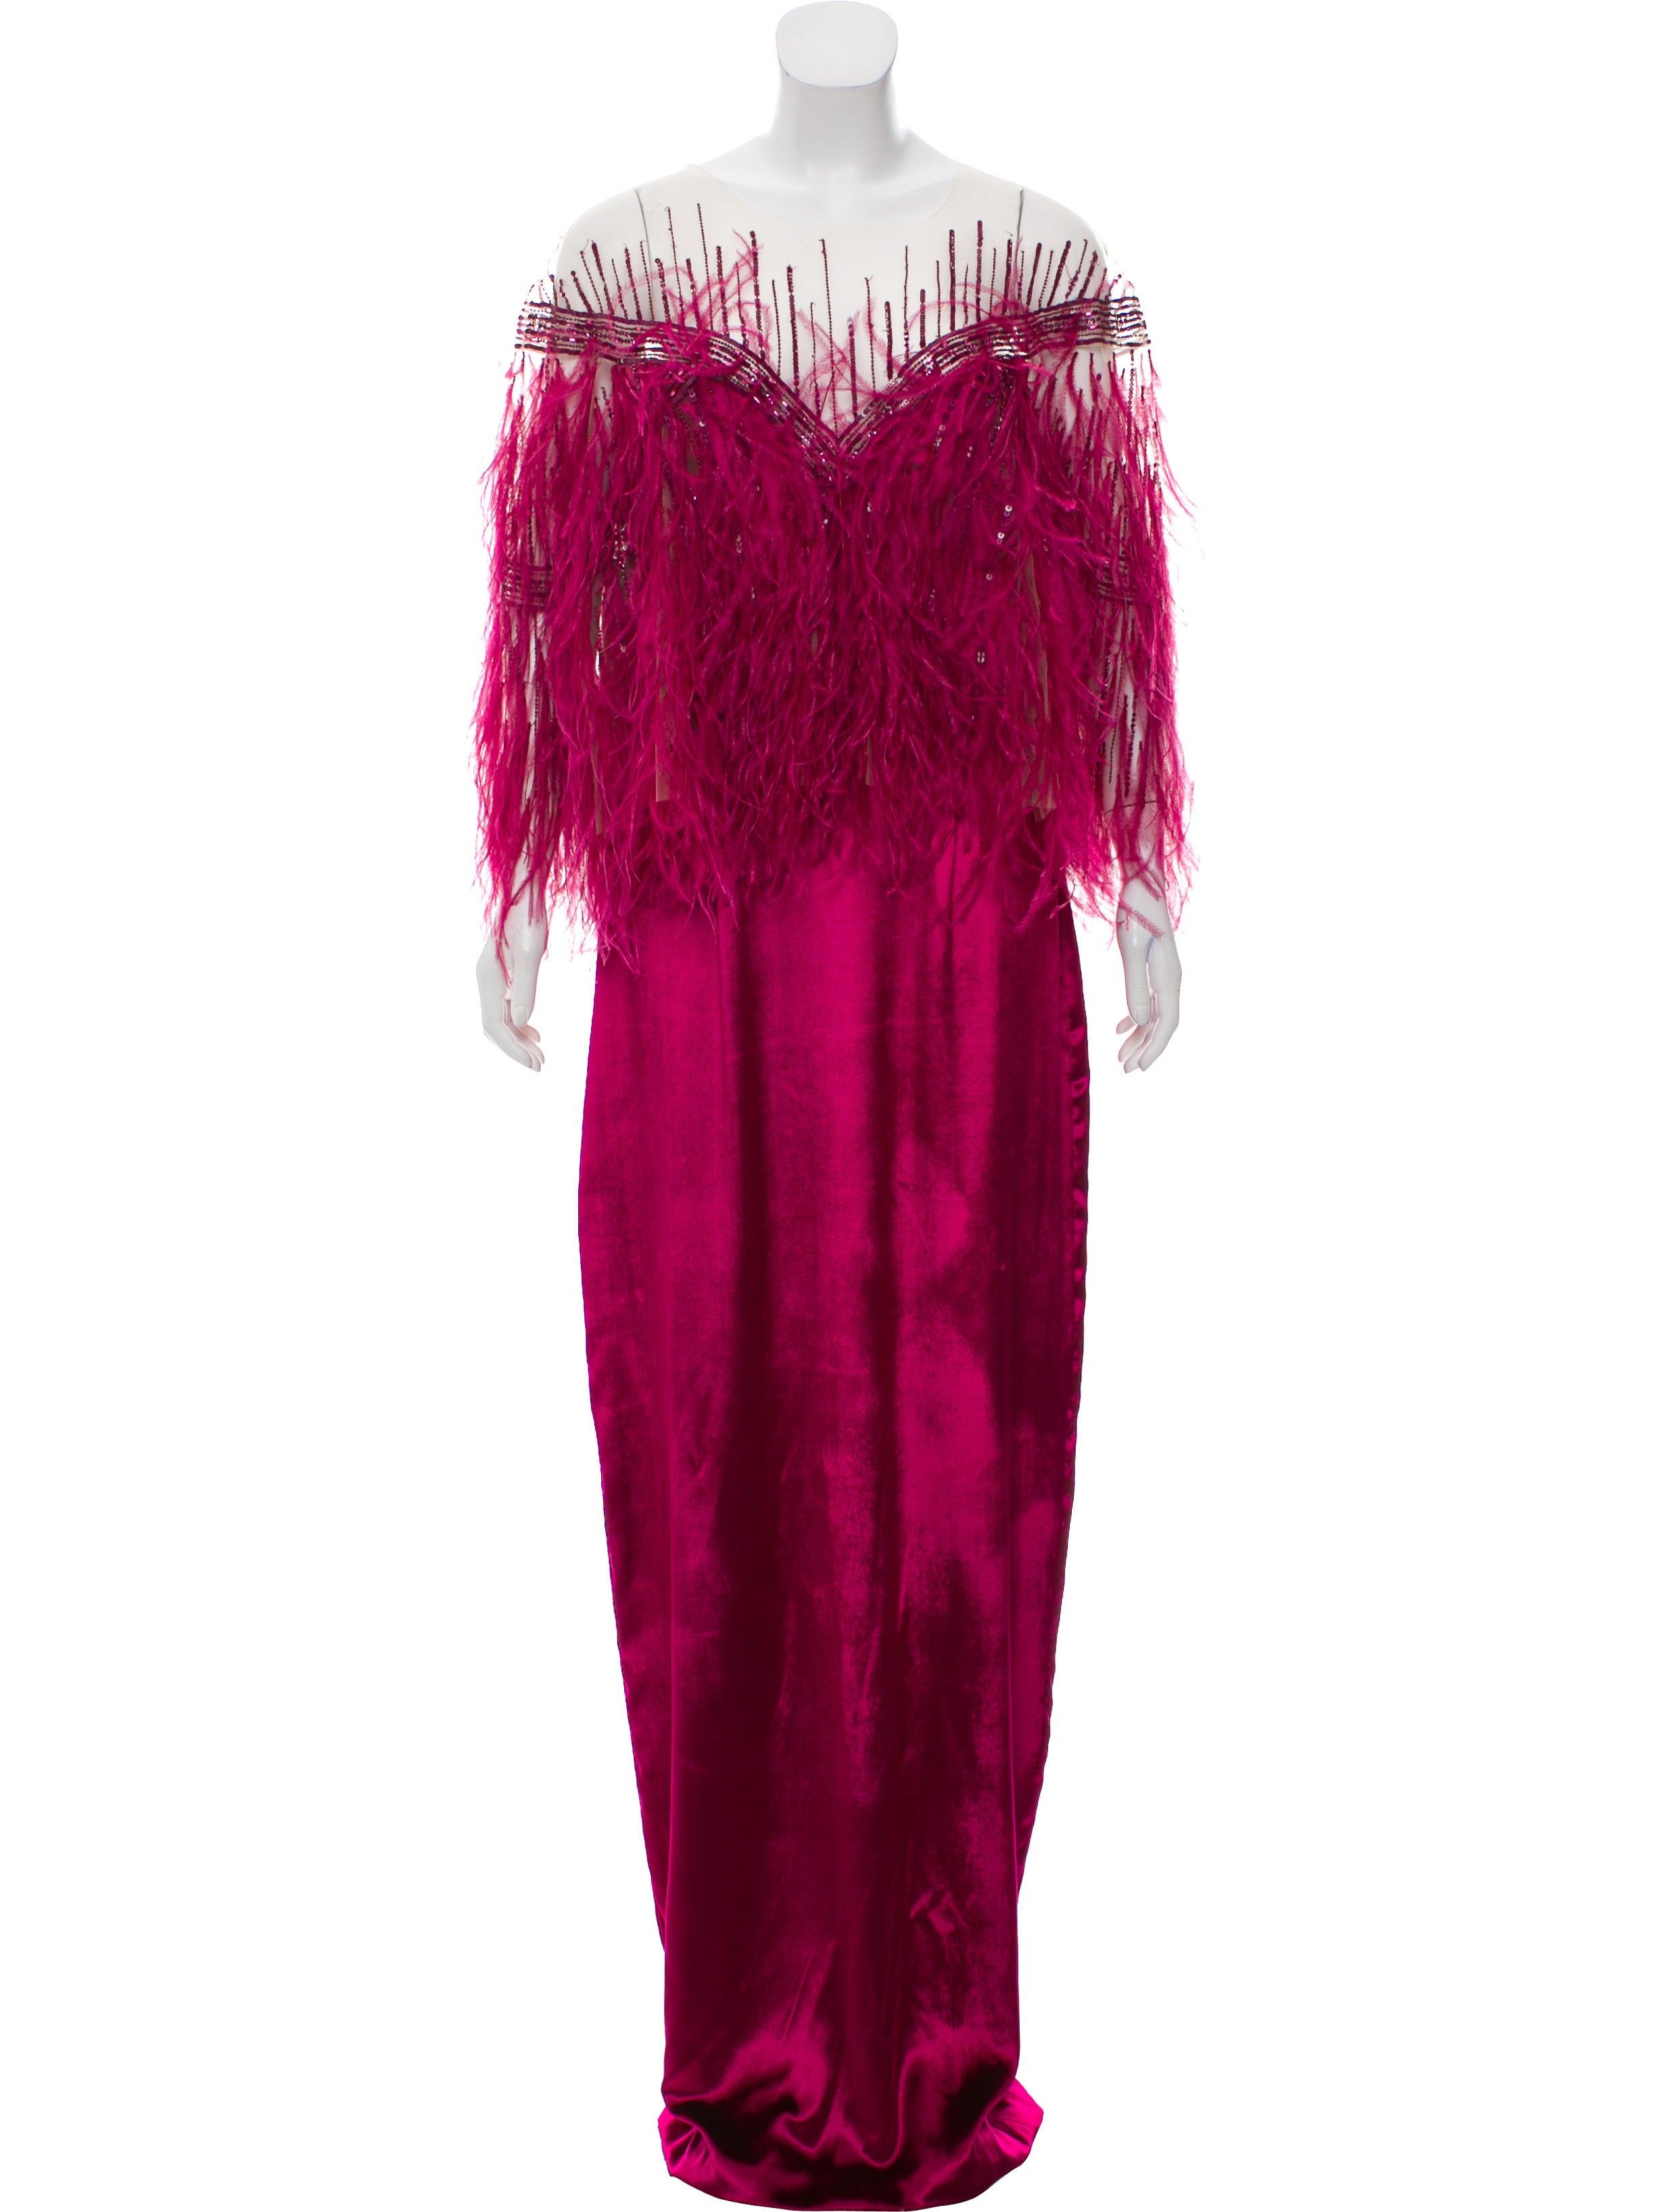 Monique Lhuillier Feather-Trimmed Evening Dress w/ Tags - Dresses ...